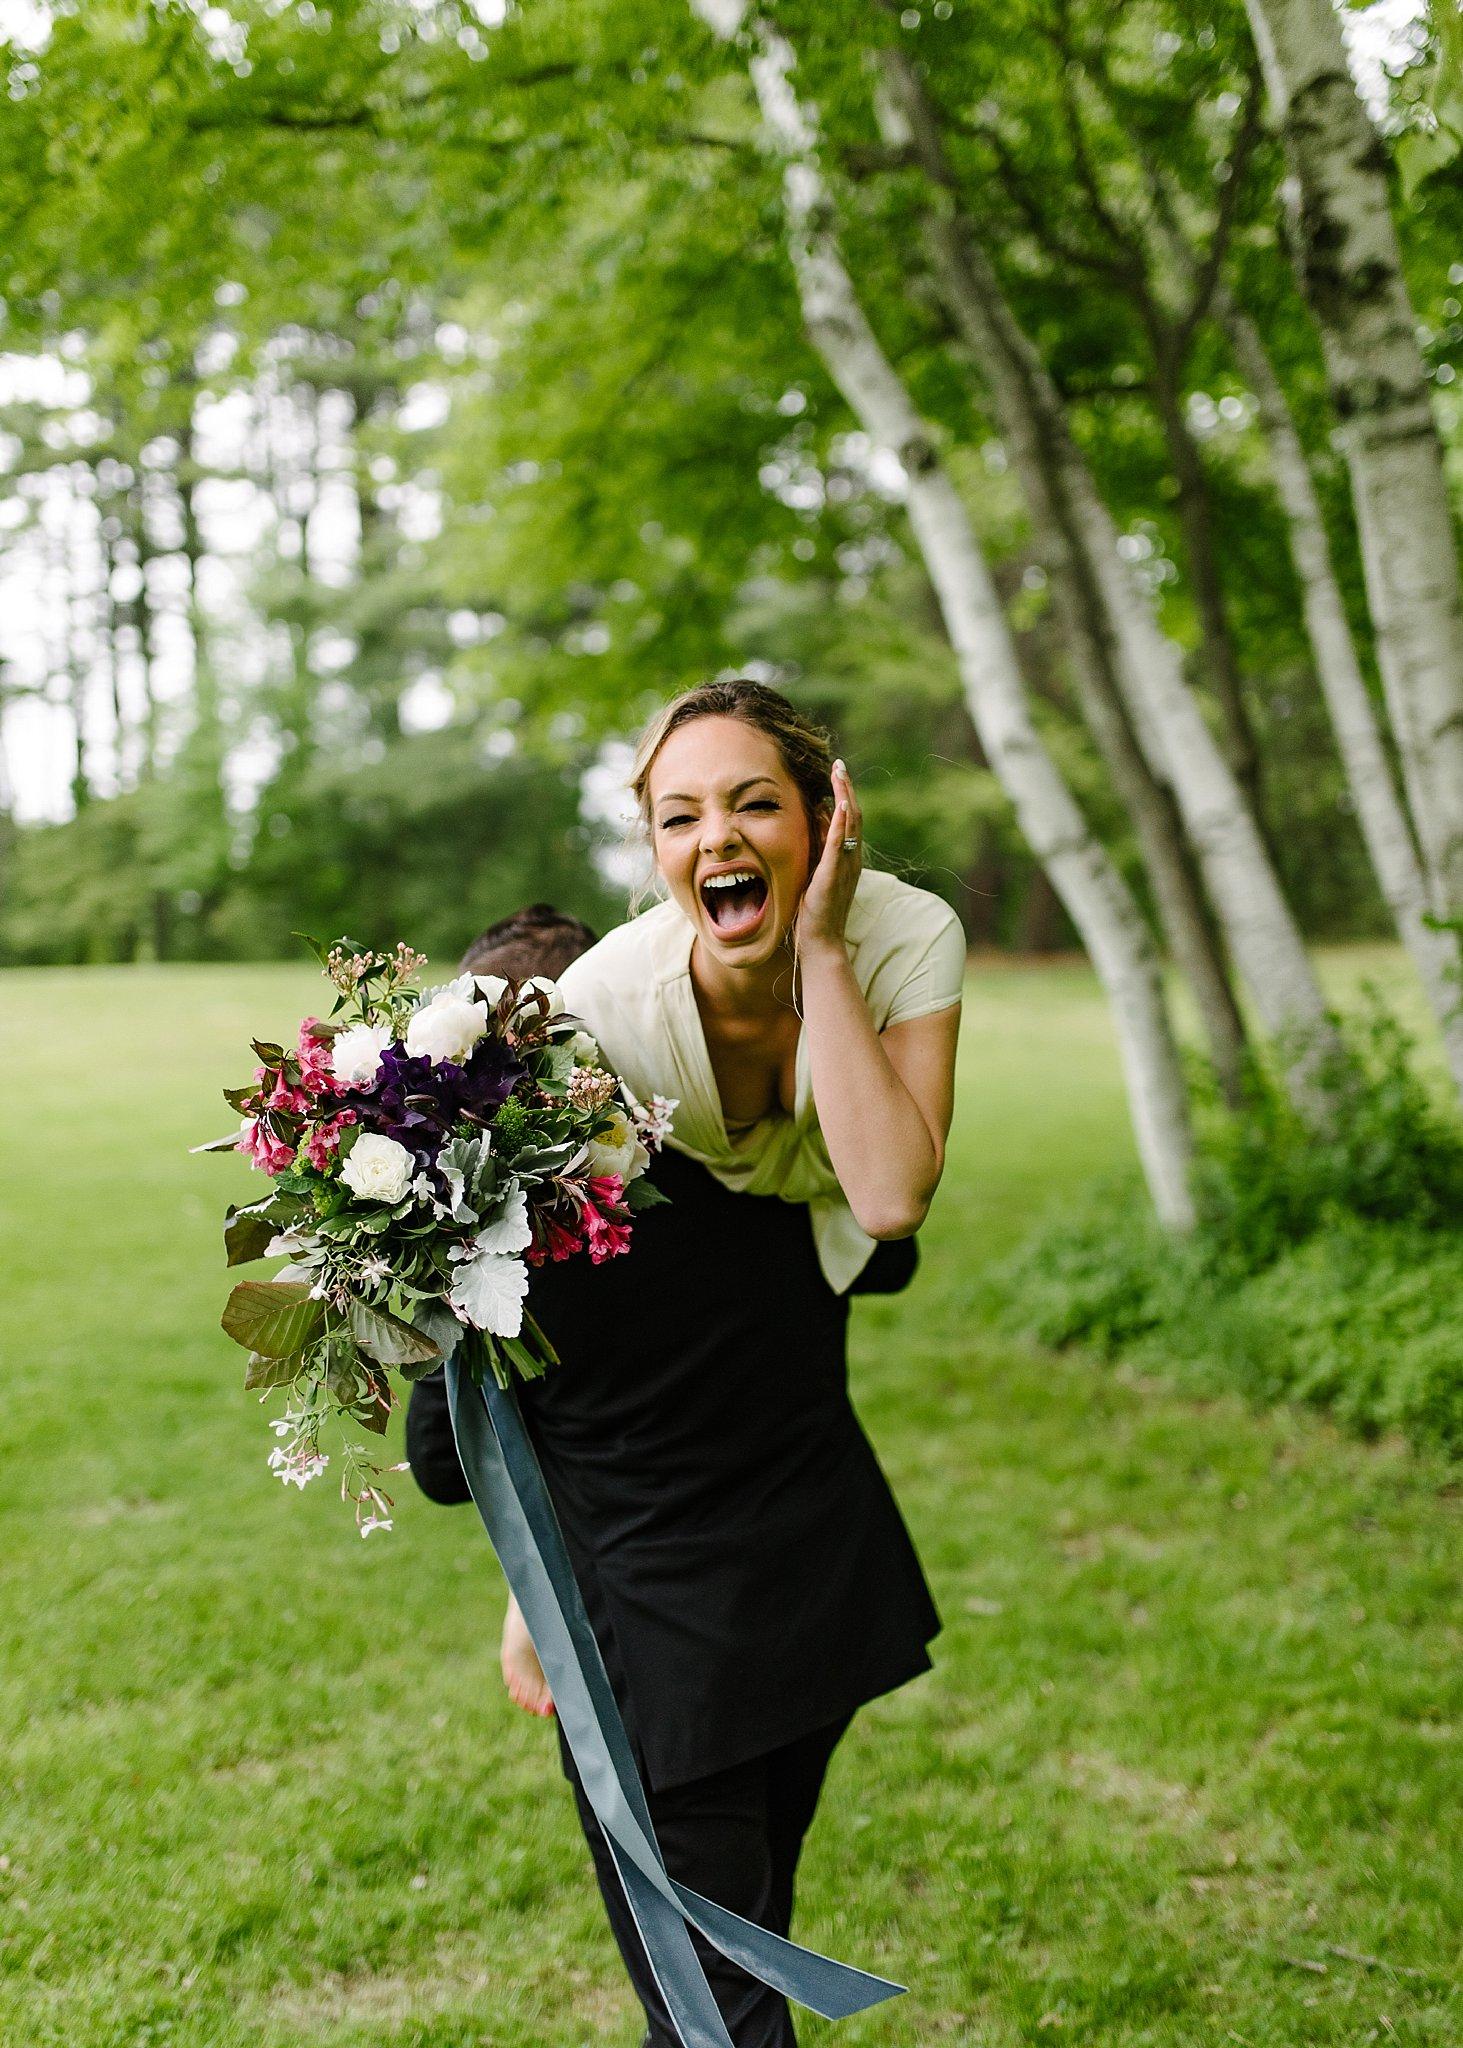 fun wedding photograph ideas.jpg